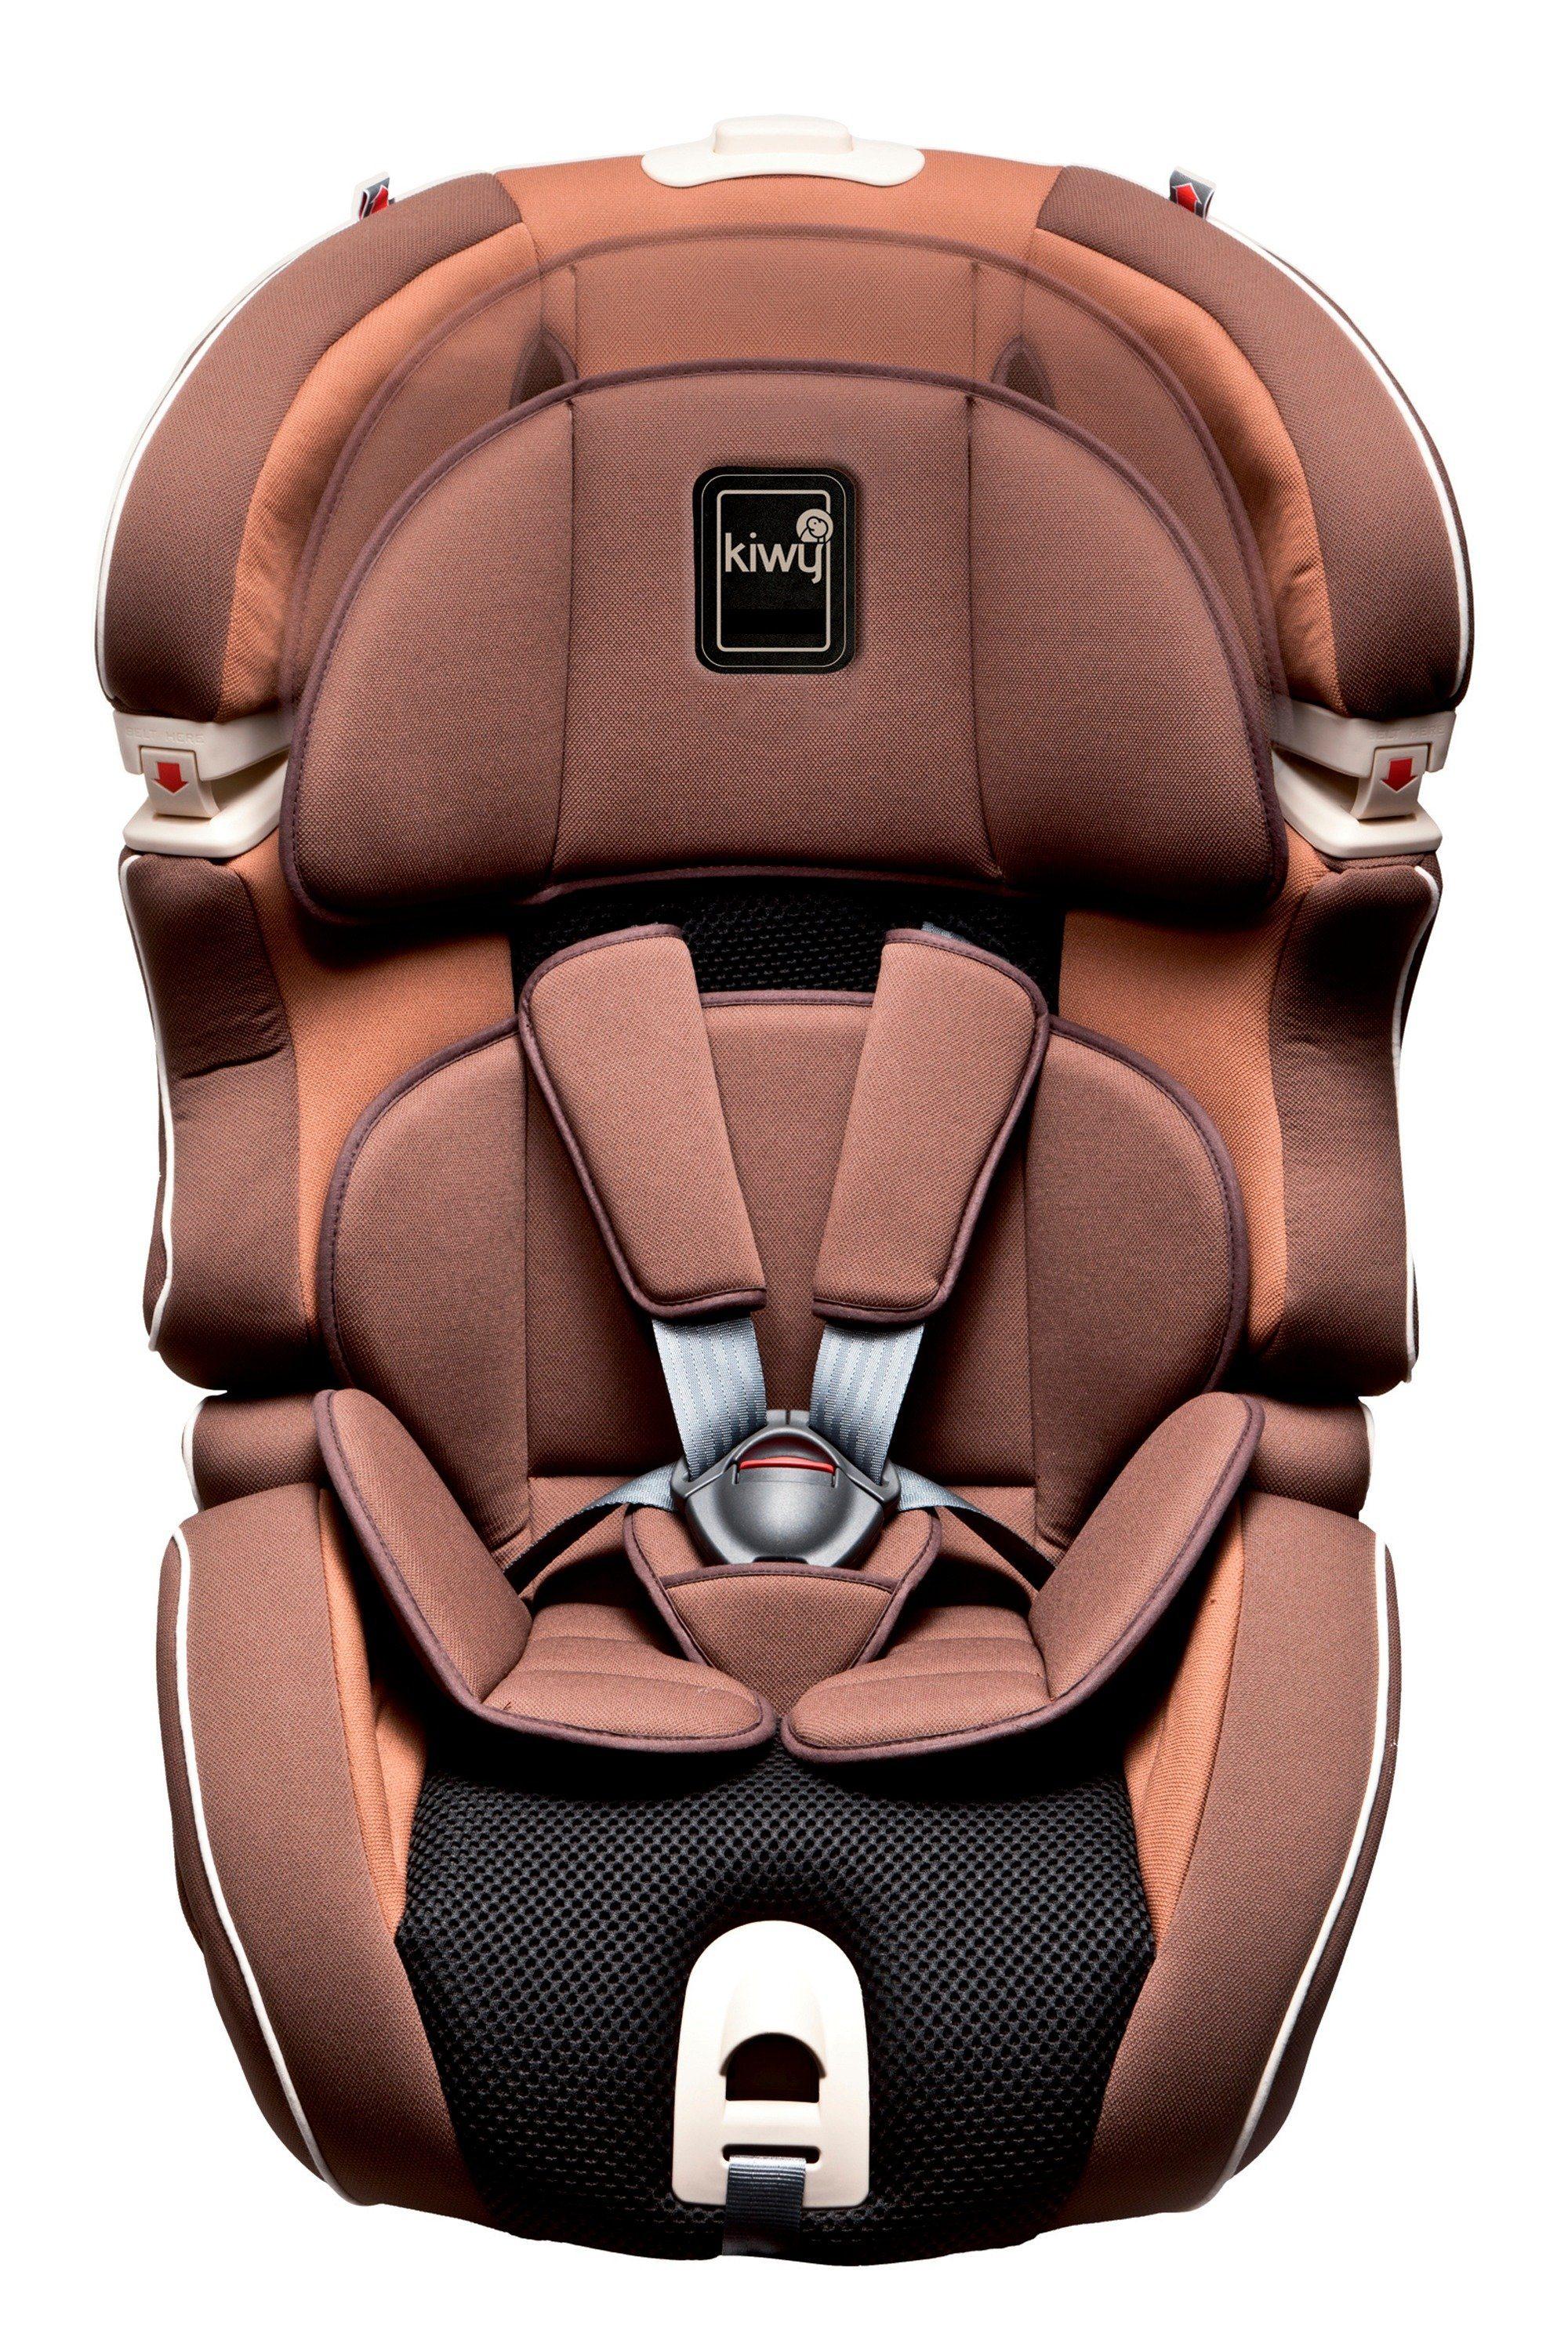 Kiwy Kindersitz »kiwy SLF123 mit Q-Fix Adapter für Isofix Haltepunkt im Auto, mokka«